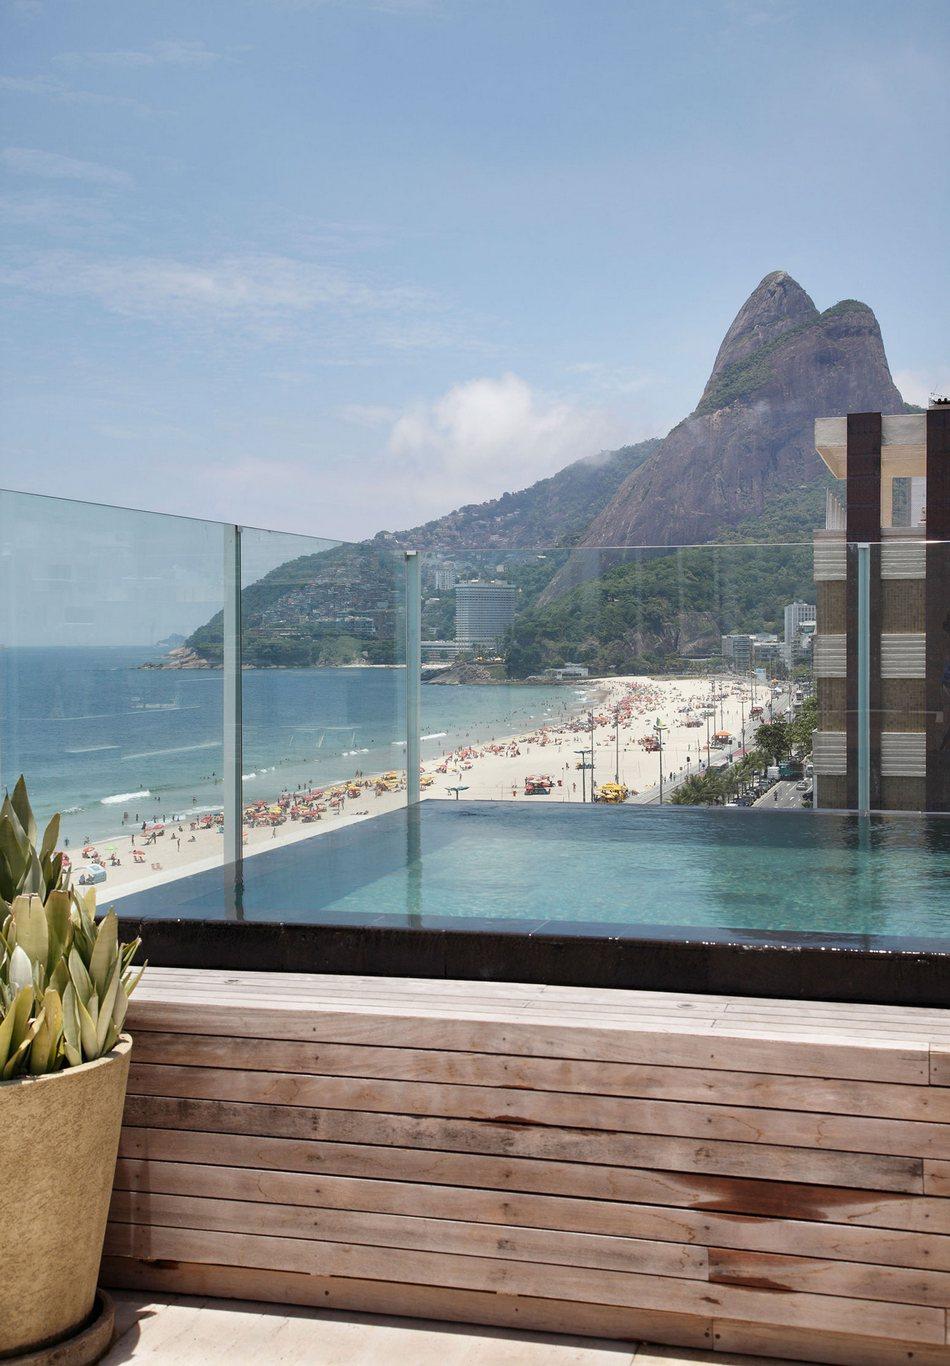 Вилла с видом на пляж в Рио-де-Жанейро